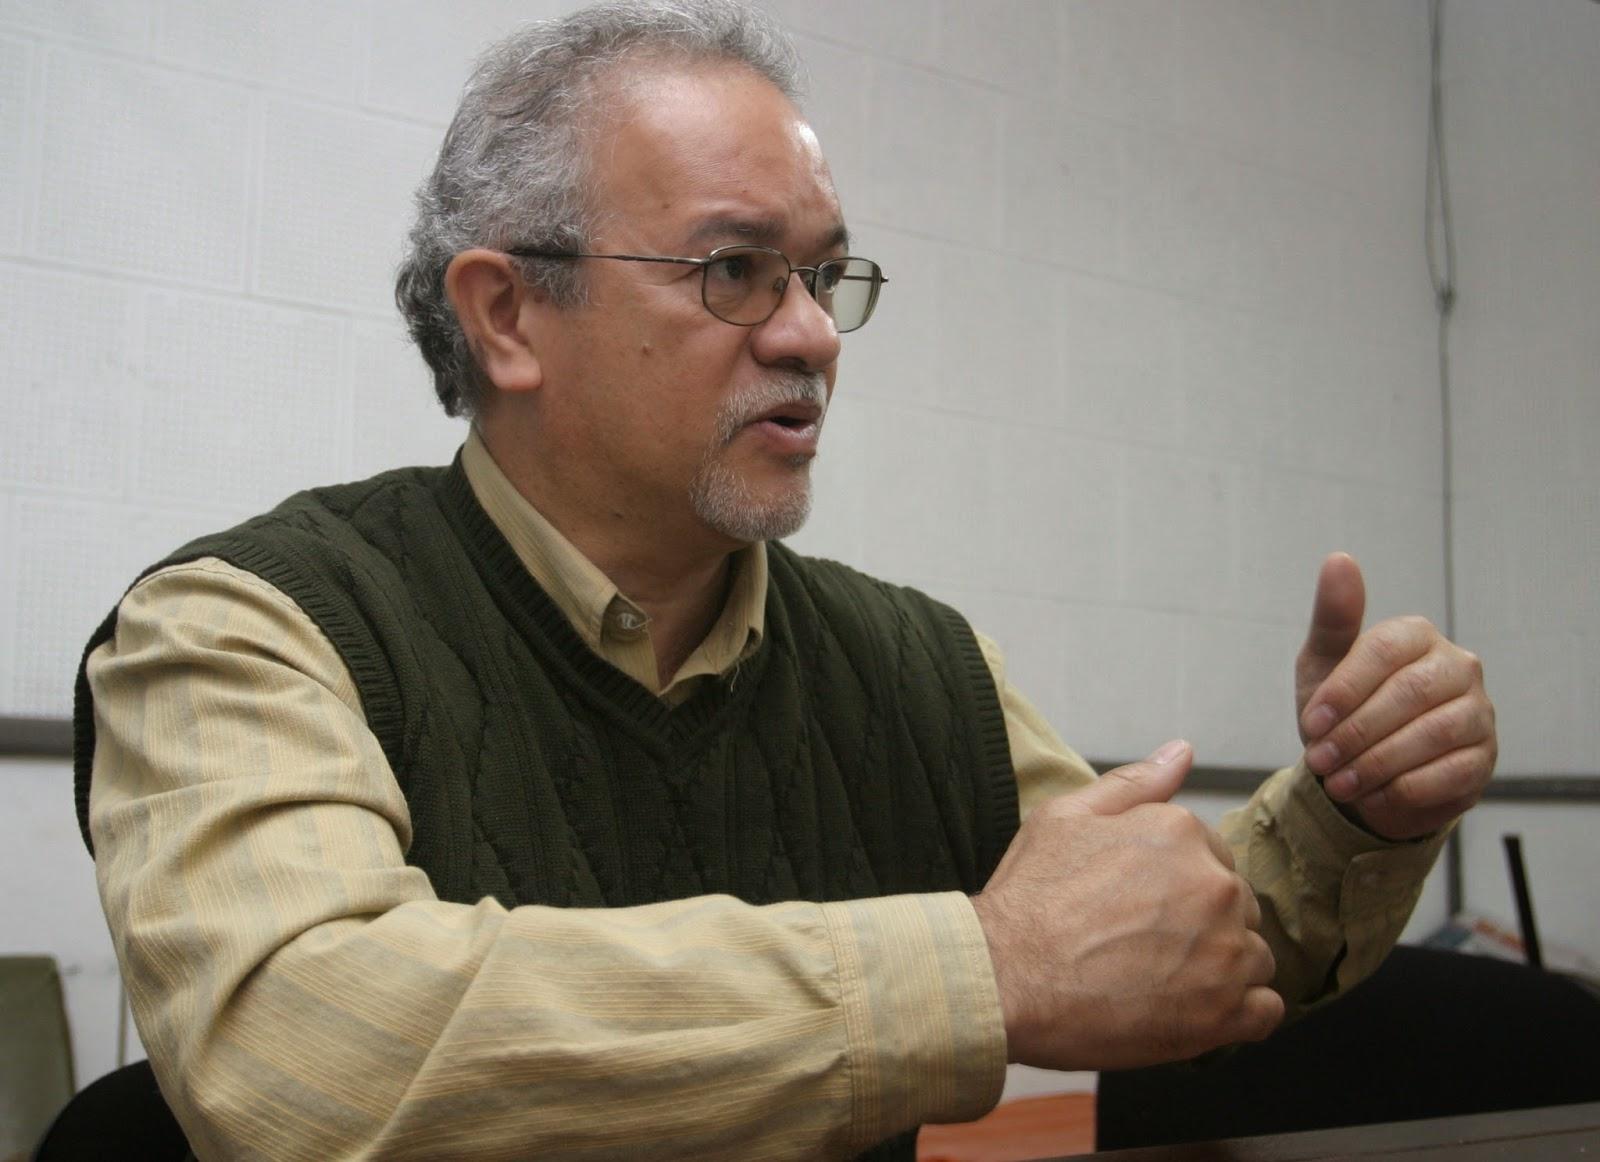 Modesto-emilio-guerrero-hasta-donde-se-atrevera-obama-contra-maduro-y-venezuela